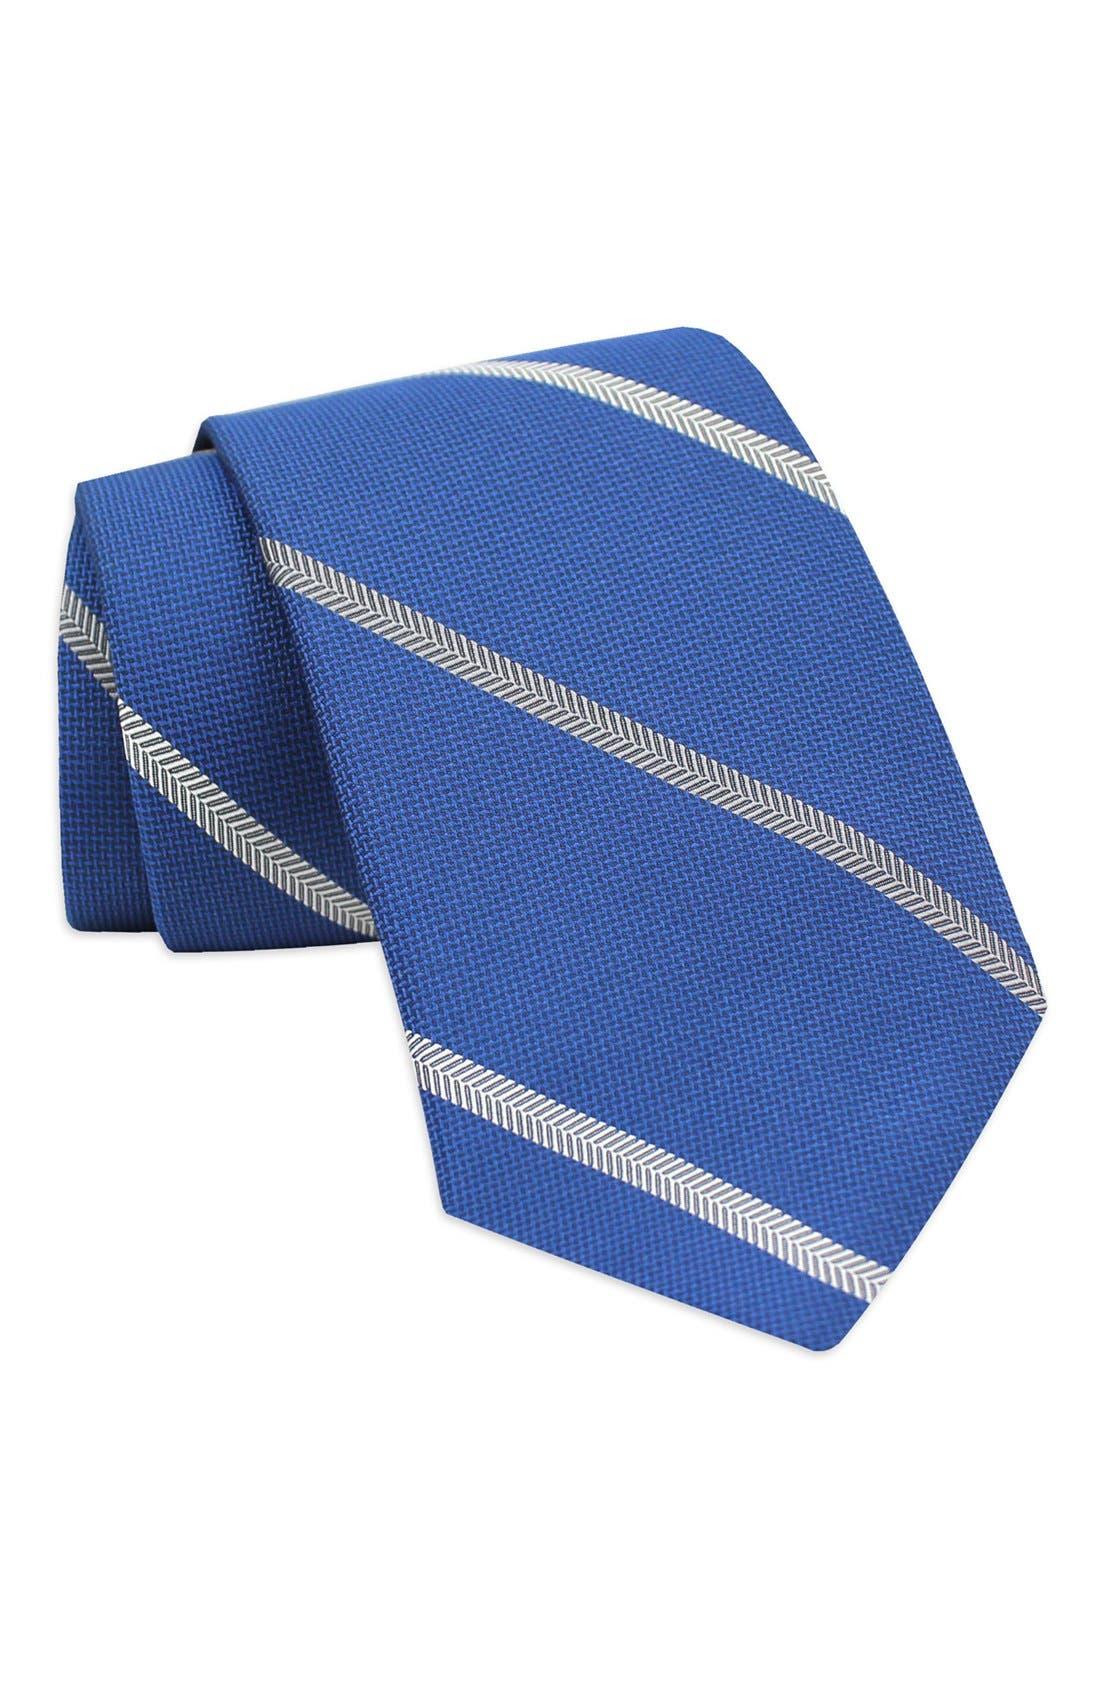 Main Image - Gitman Stripe Woven Silk Tie